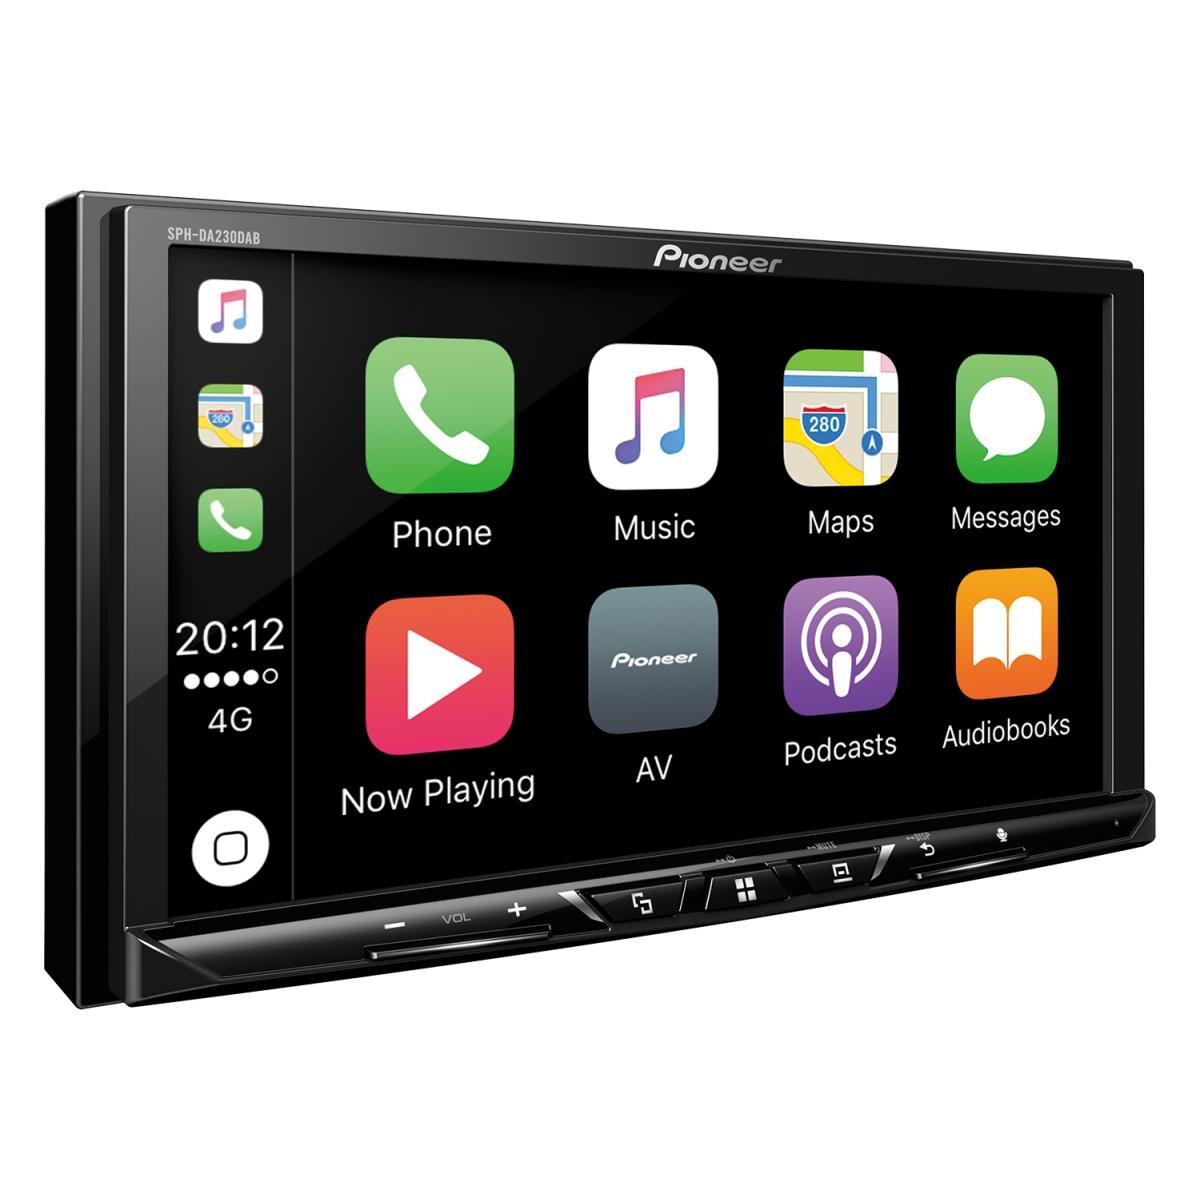 Pioneer-SPH-DA230DAB-2DINAutoradio-7-Zoll-Clear-Resistive-Touchpanel-Bluetooth-DAB-Digitalradio-Apple-CarPlay-Android-Auto